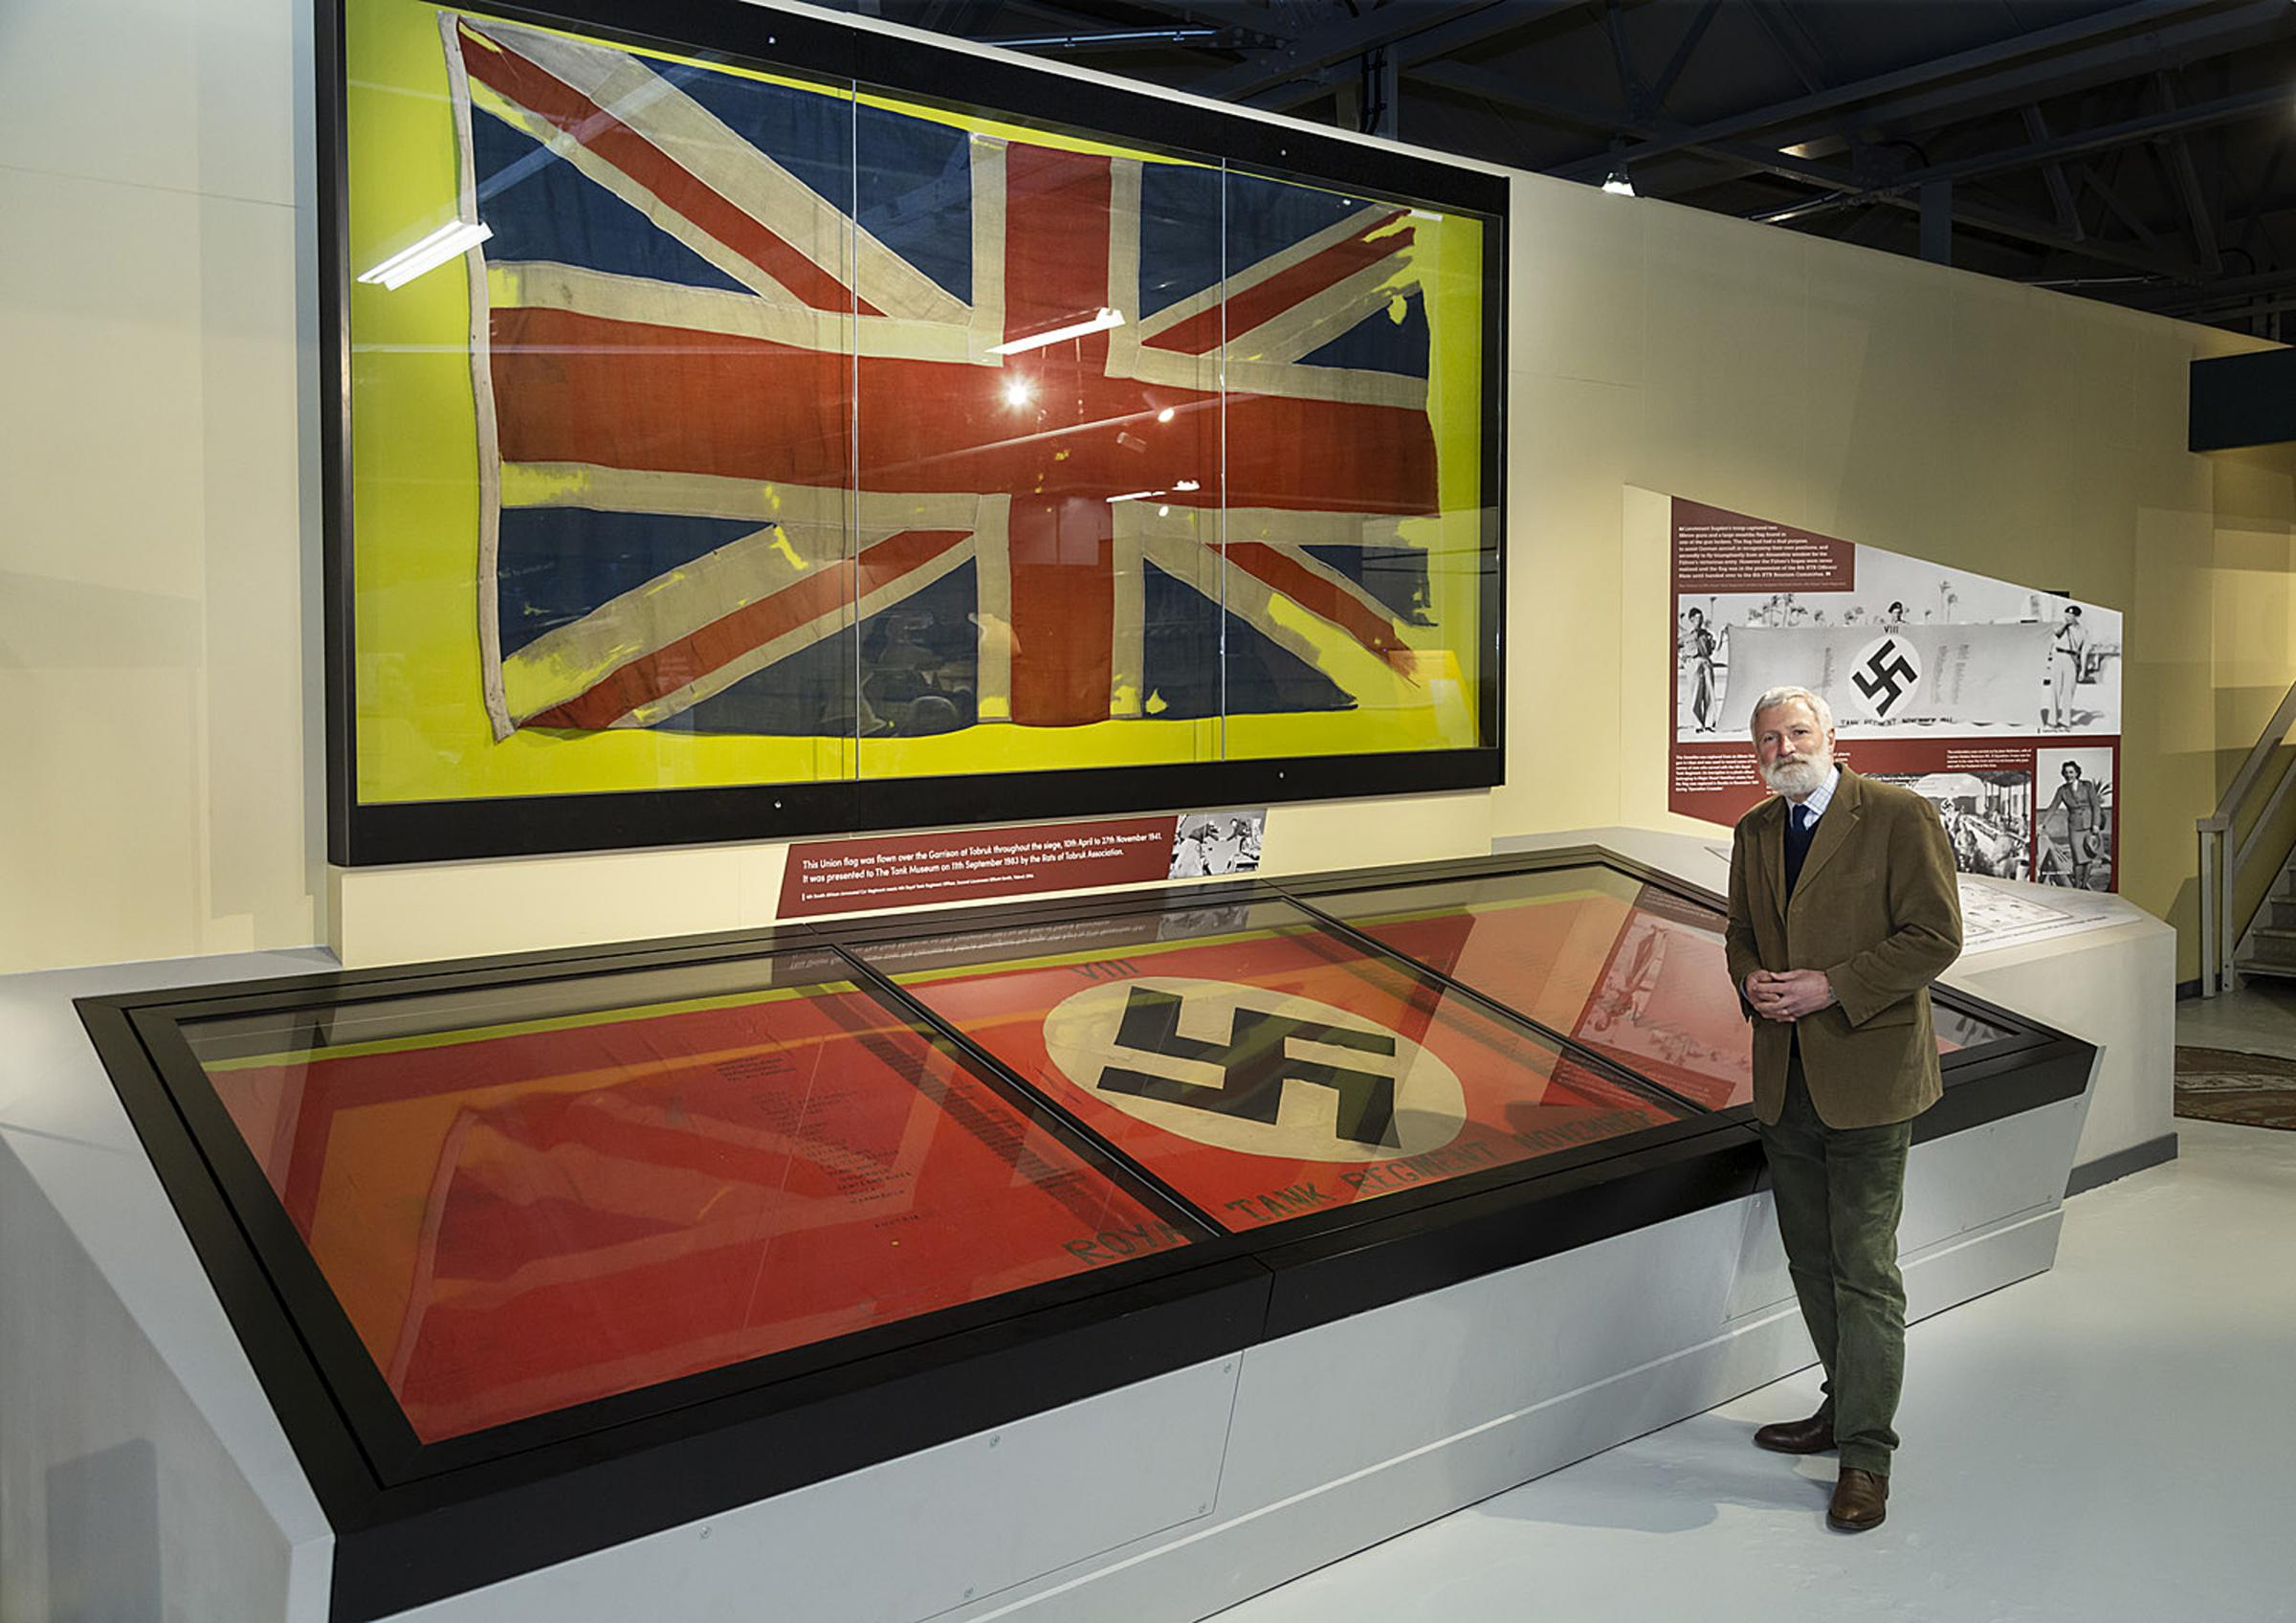 Historic World War II Union Jack and swastika in exhibition